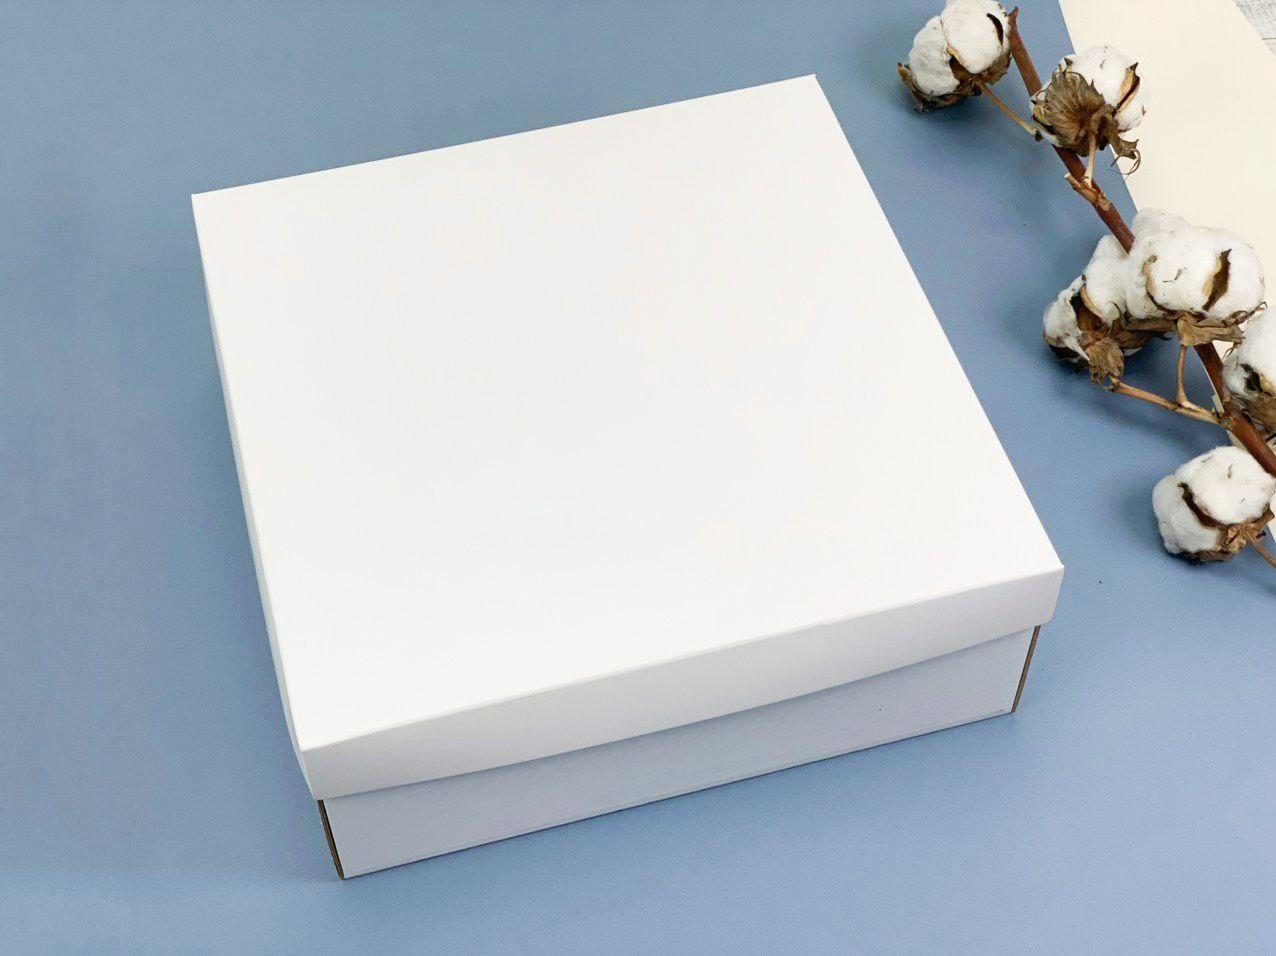 Подарочная коробка без принта. Размер: 25*25*9